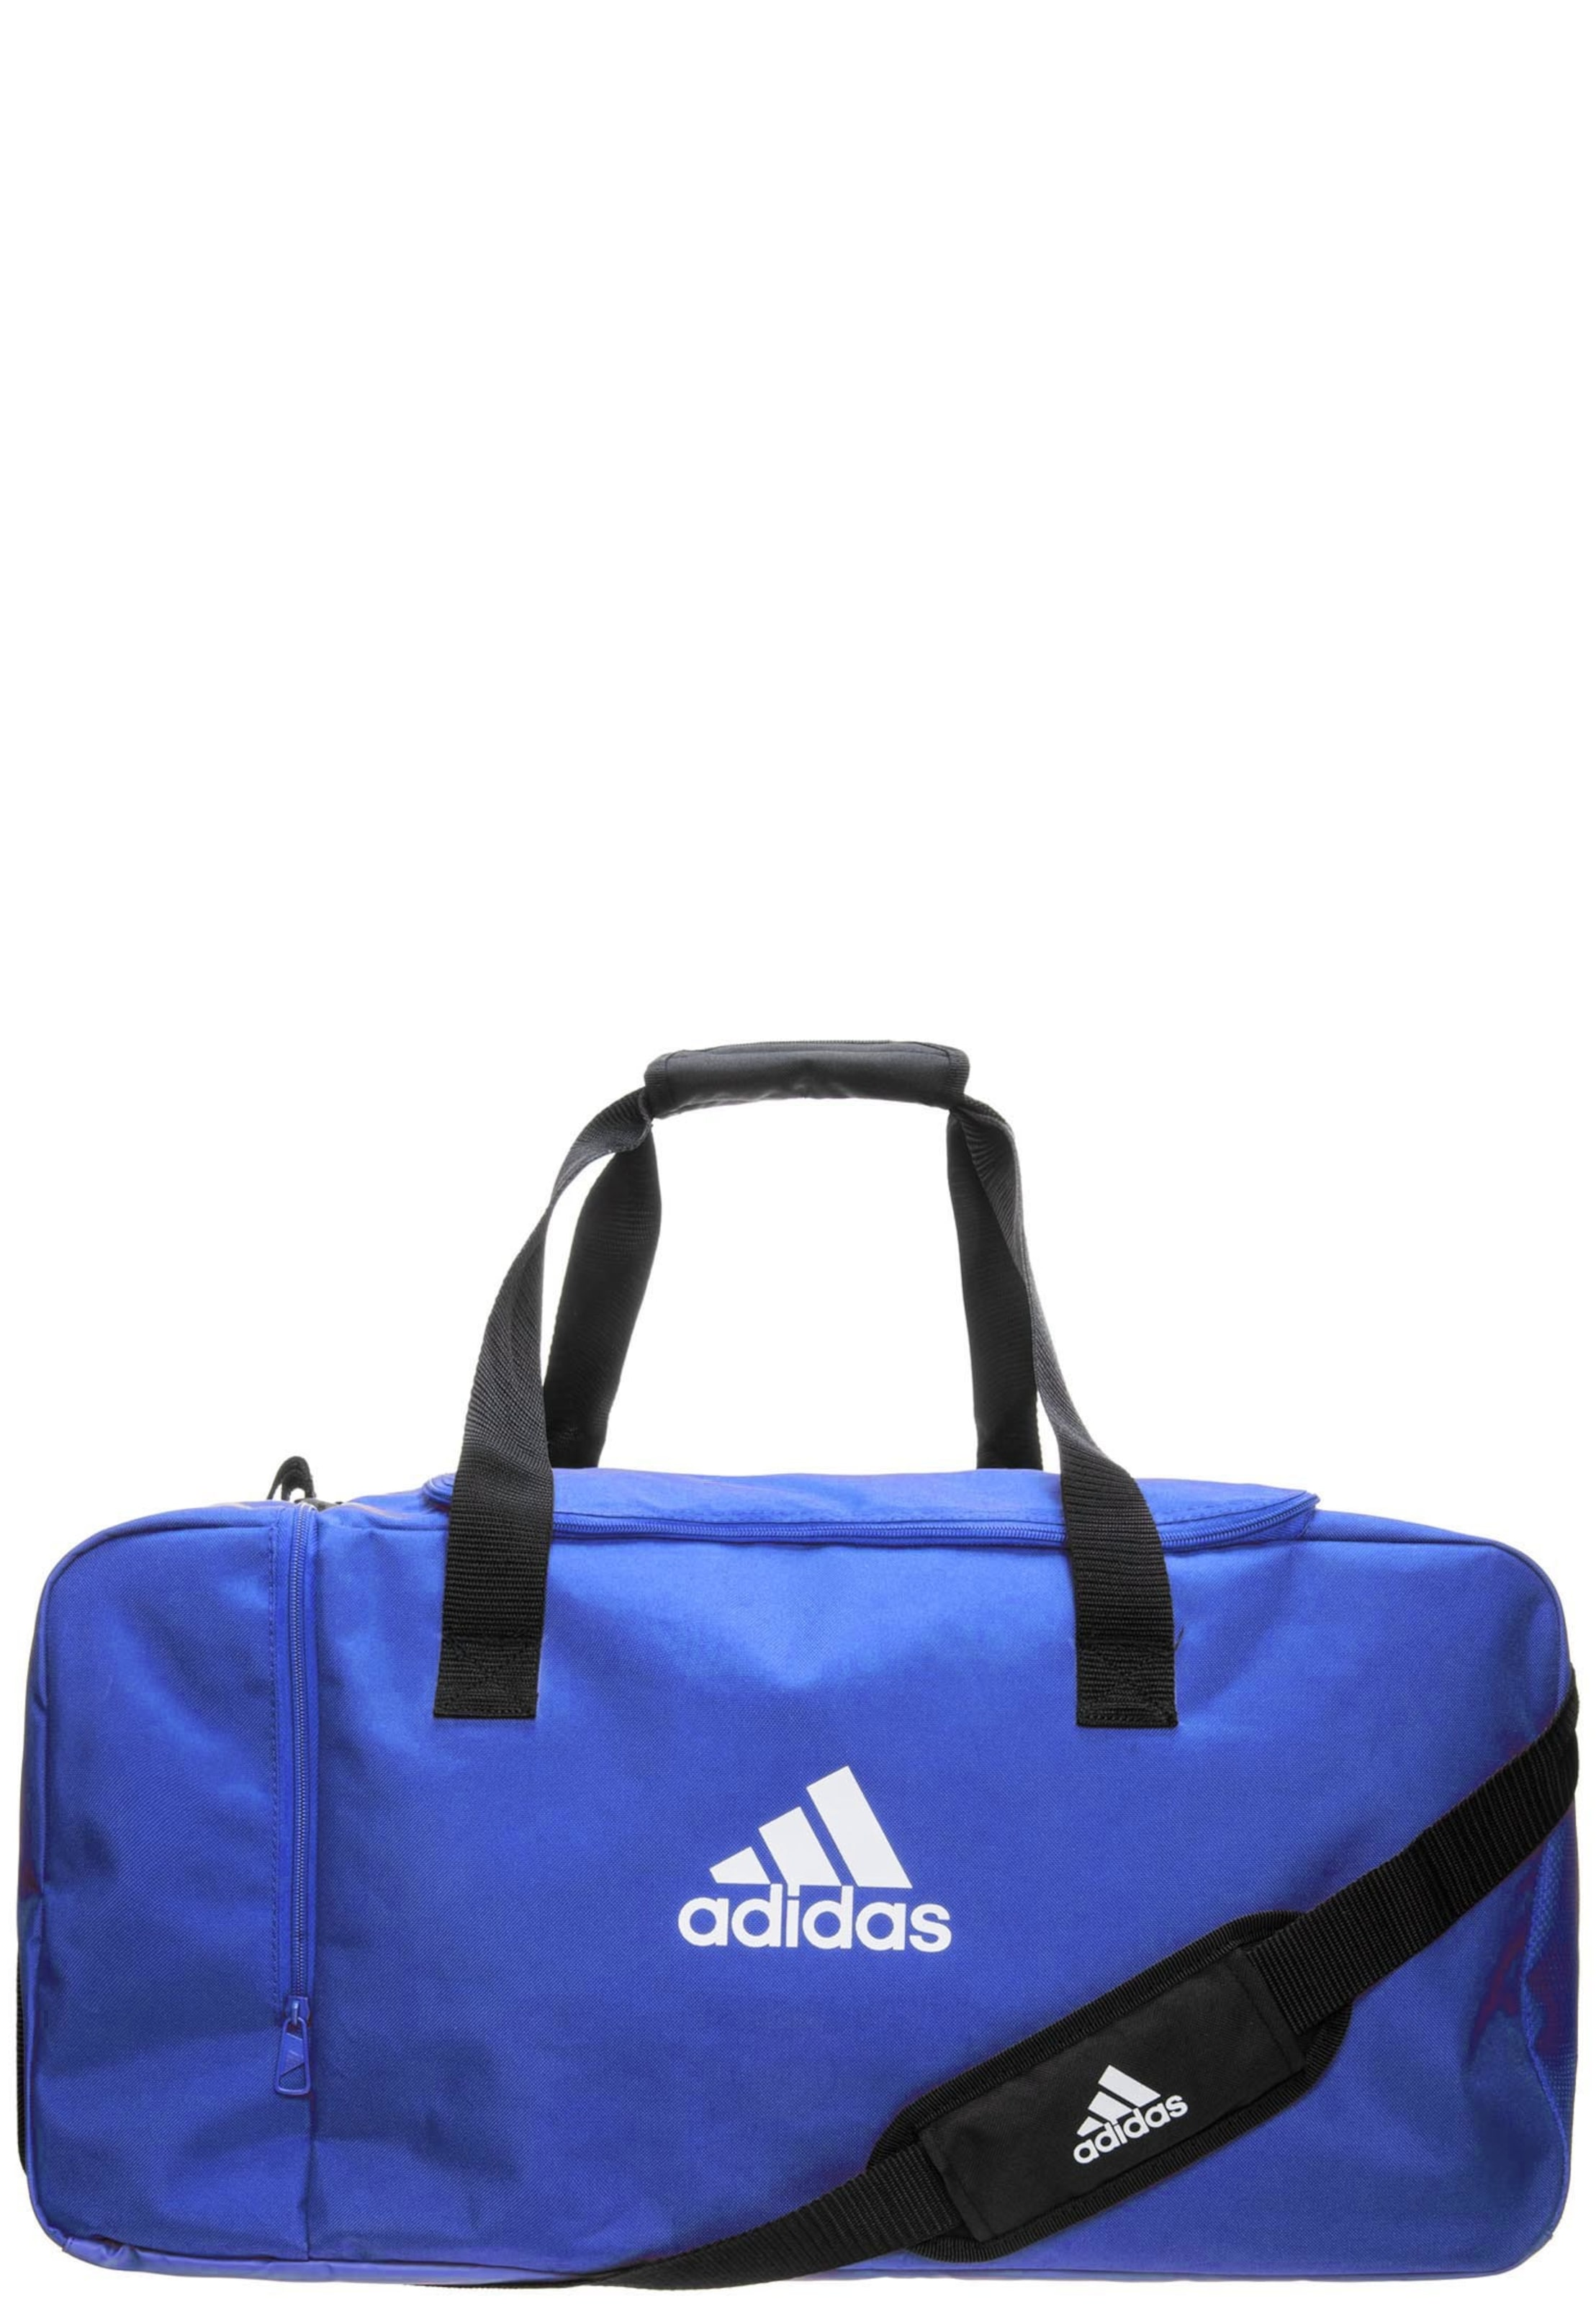 Small' De NoirBlanc Sport Performance En Sac 'tiro Adidas Duffel TKJclF13